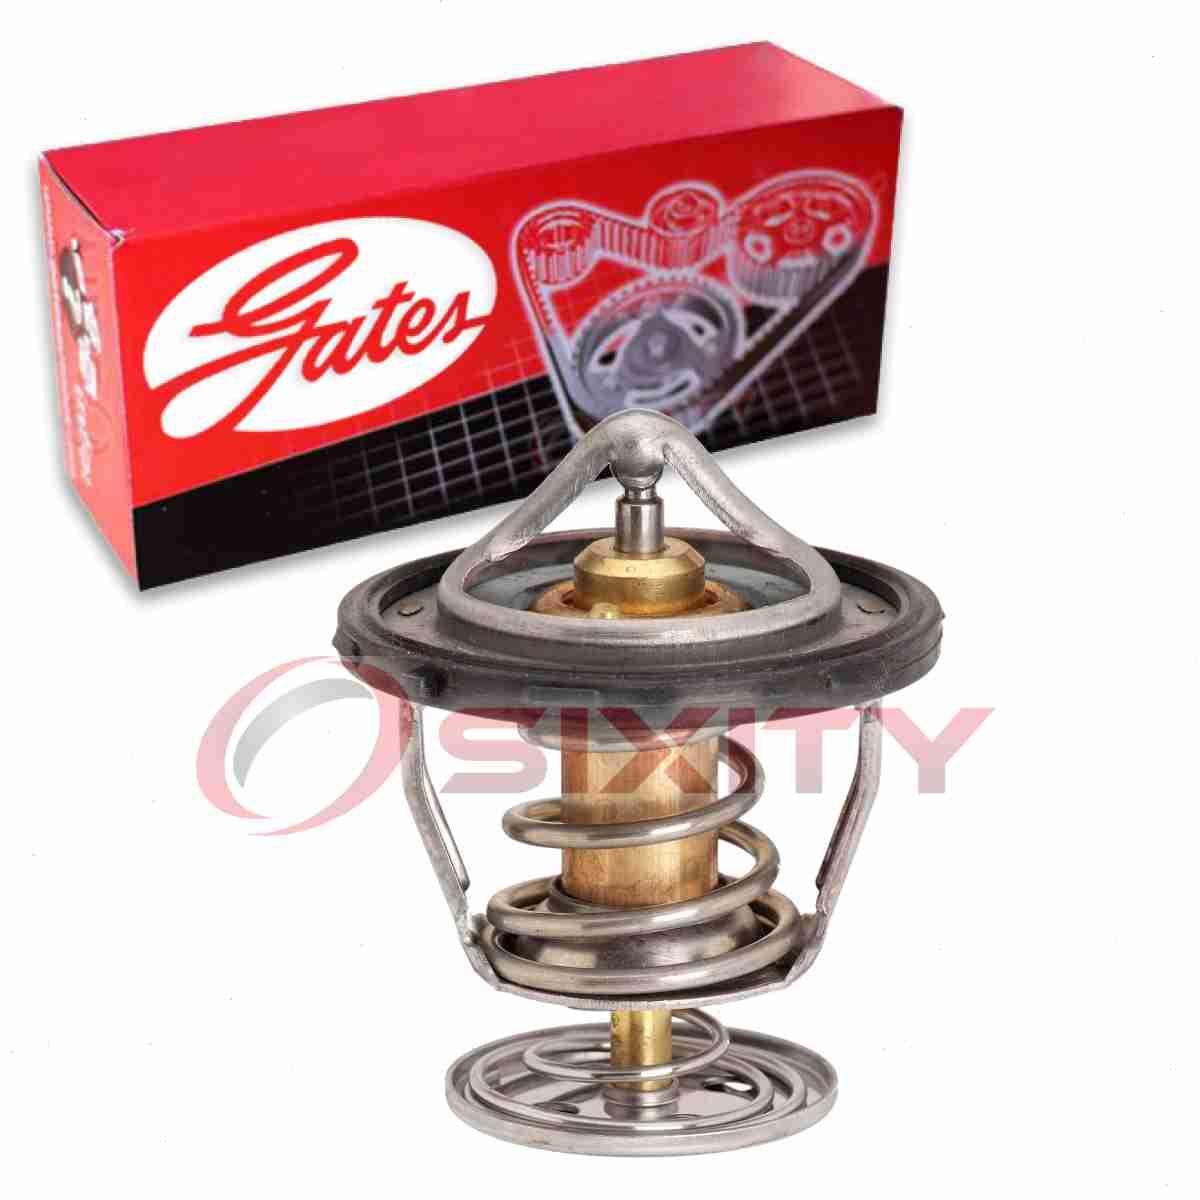 nc Gates Coolant Thermostat for 2002-2006 Cadillac Escalade 6.0L 5.3L V8